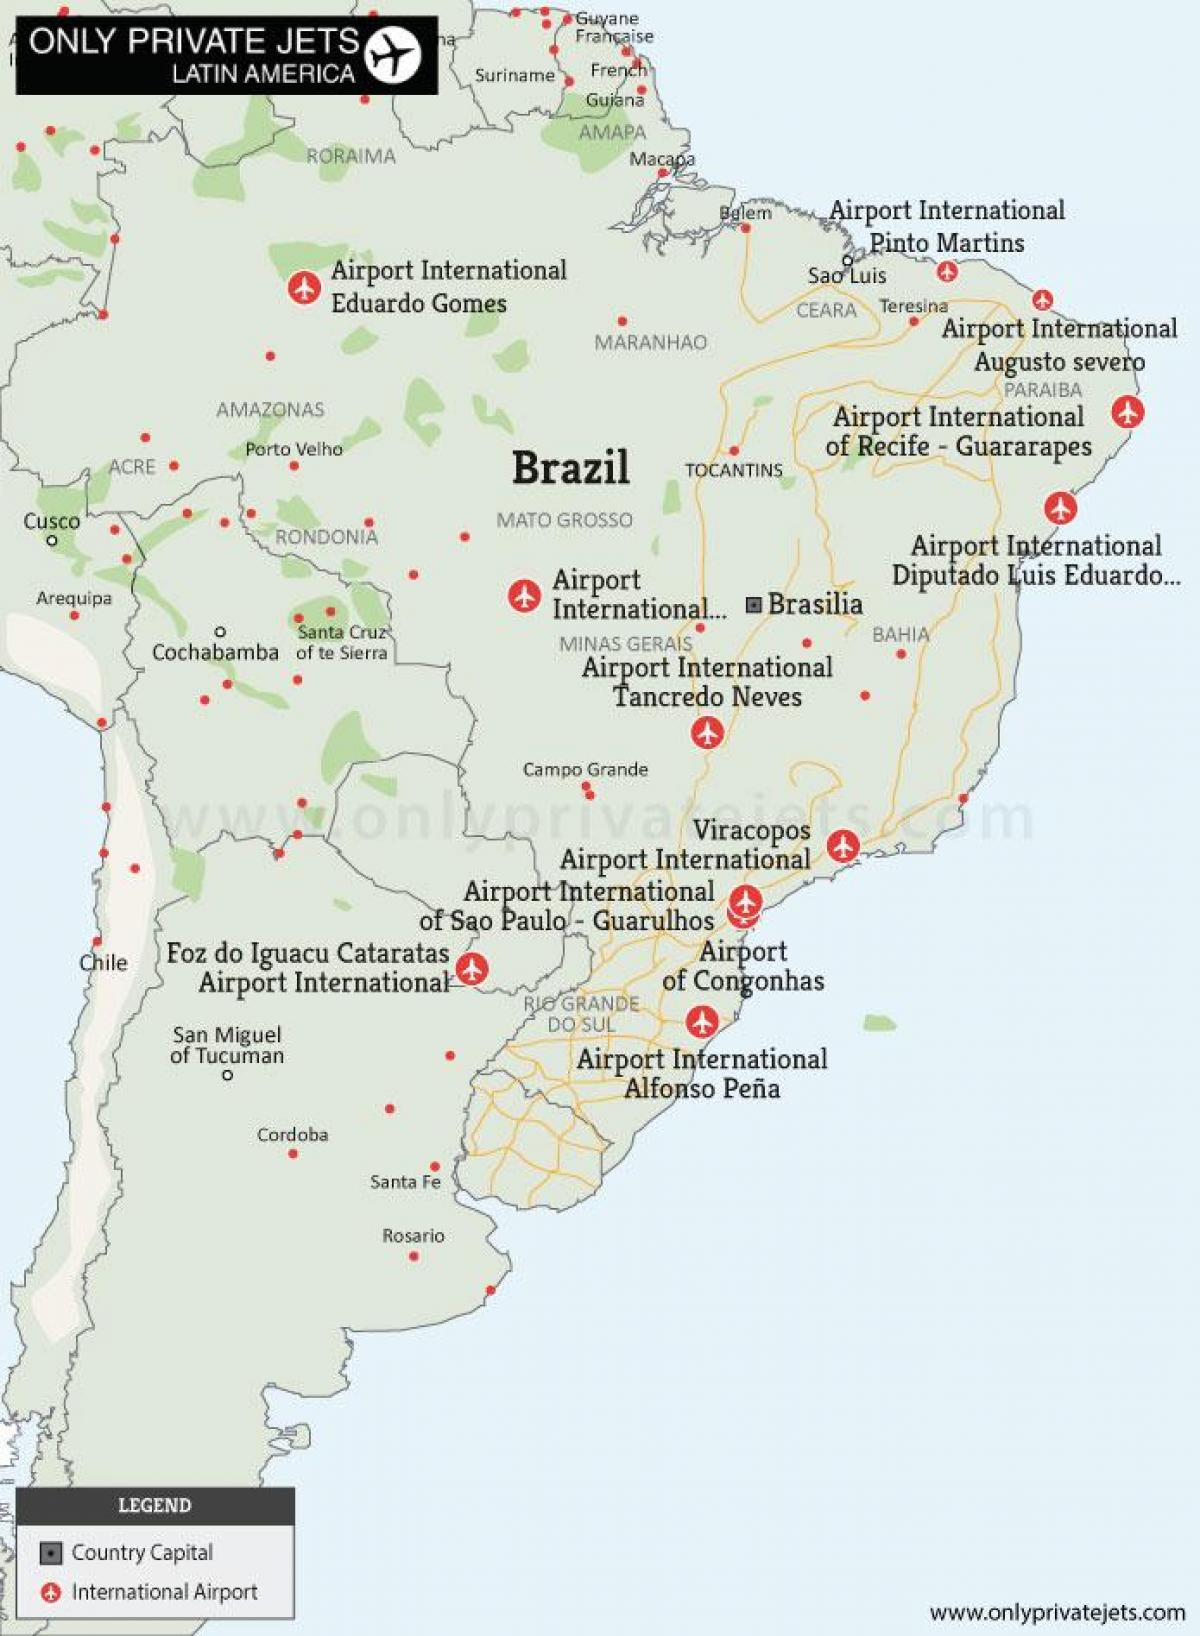 flughäfen brasilien karte Brasilien Flughäfen Karte   Flughäfen Karte von Brasilien (South